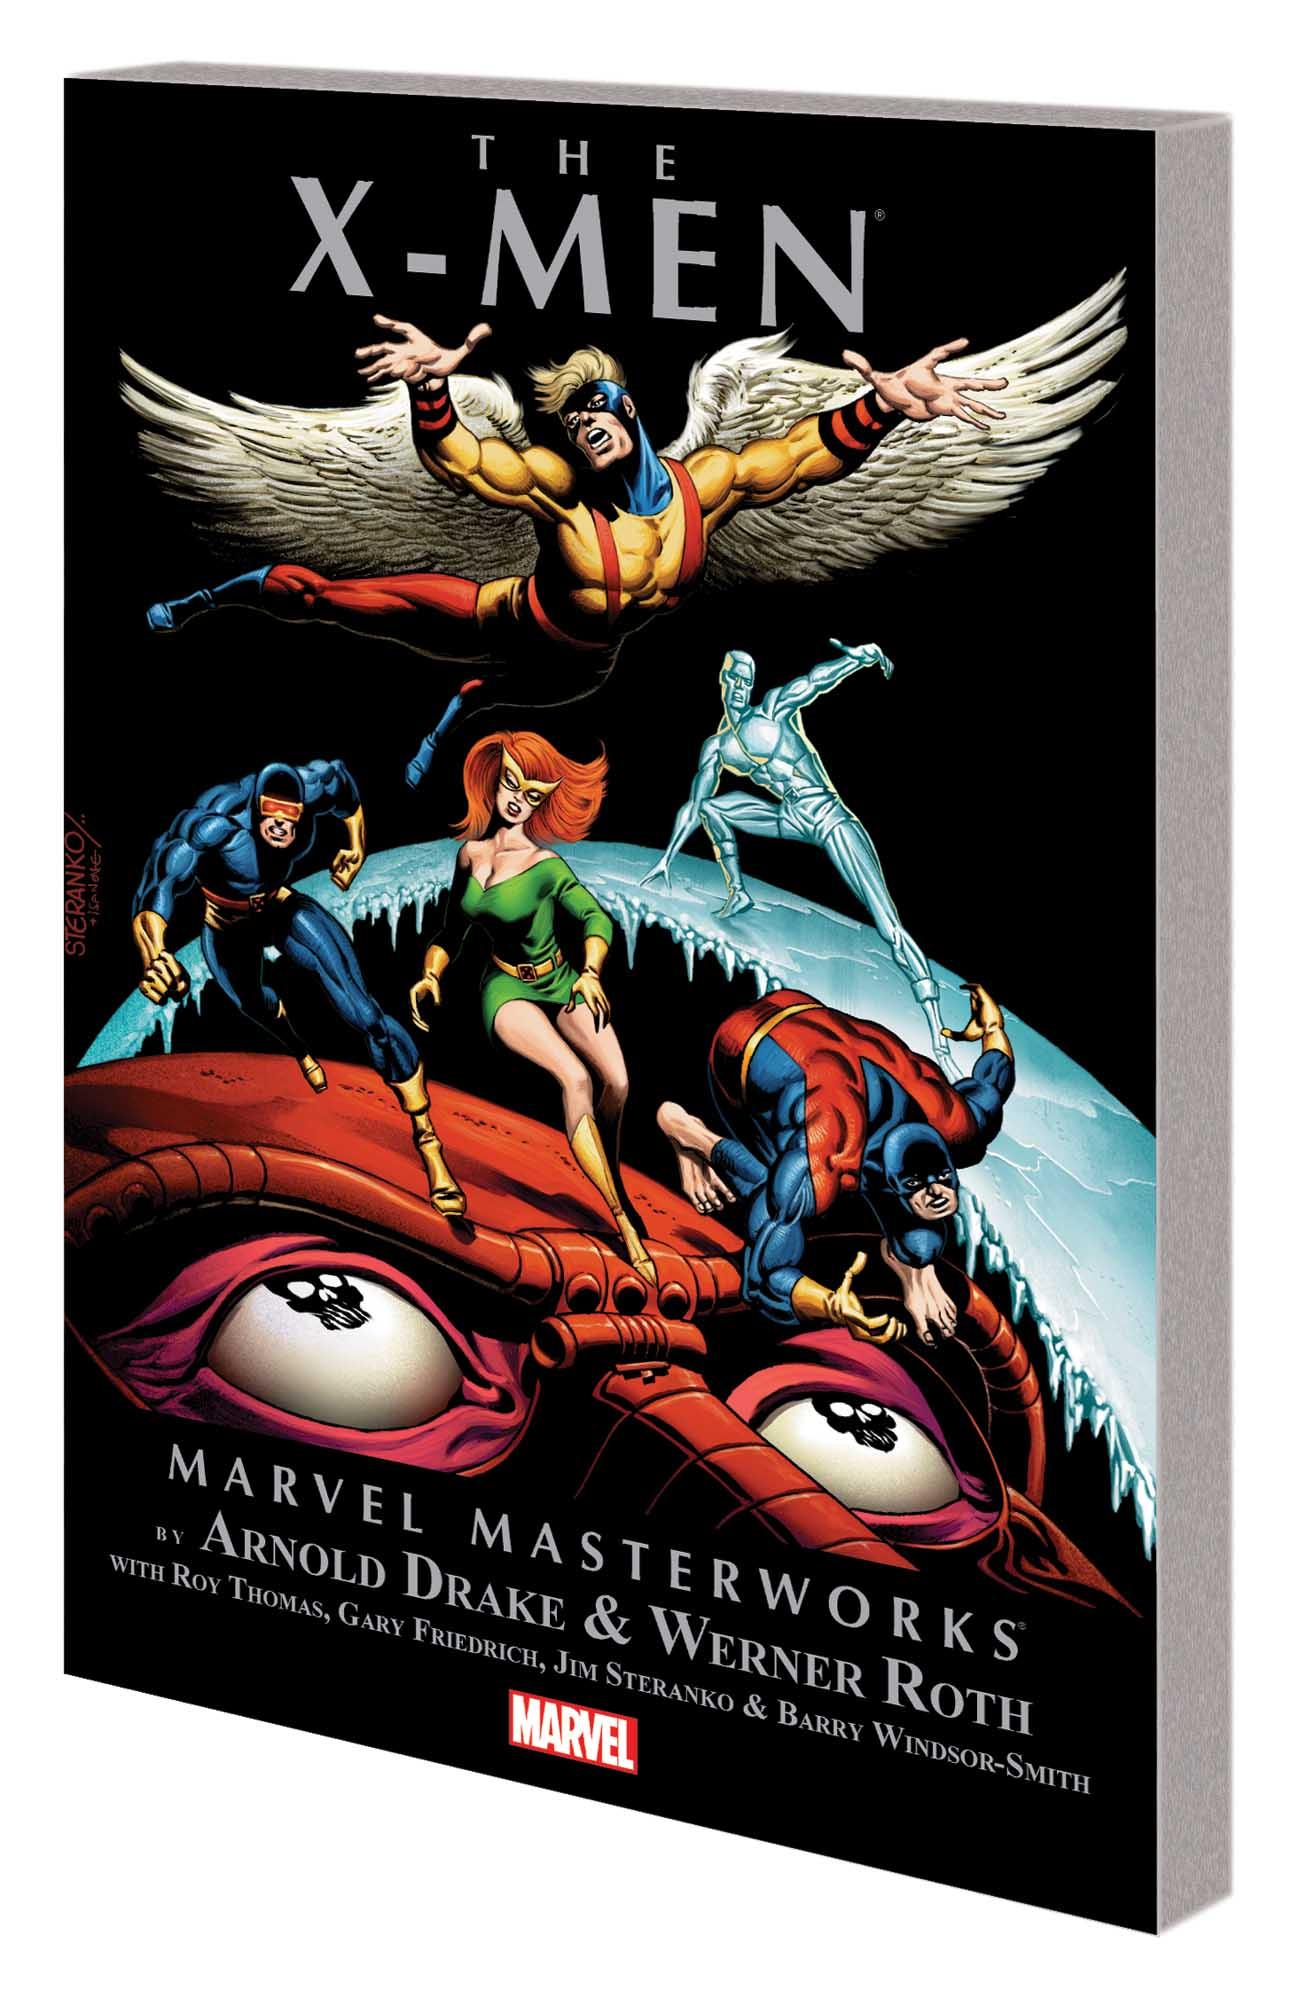 Marvel Masterworks: The X-Men Vol. 5 (Trade Paperback)